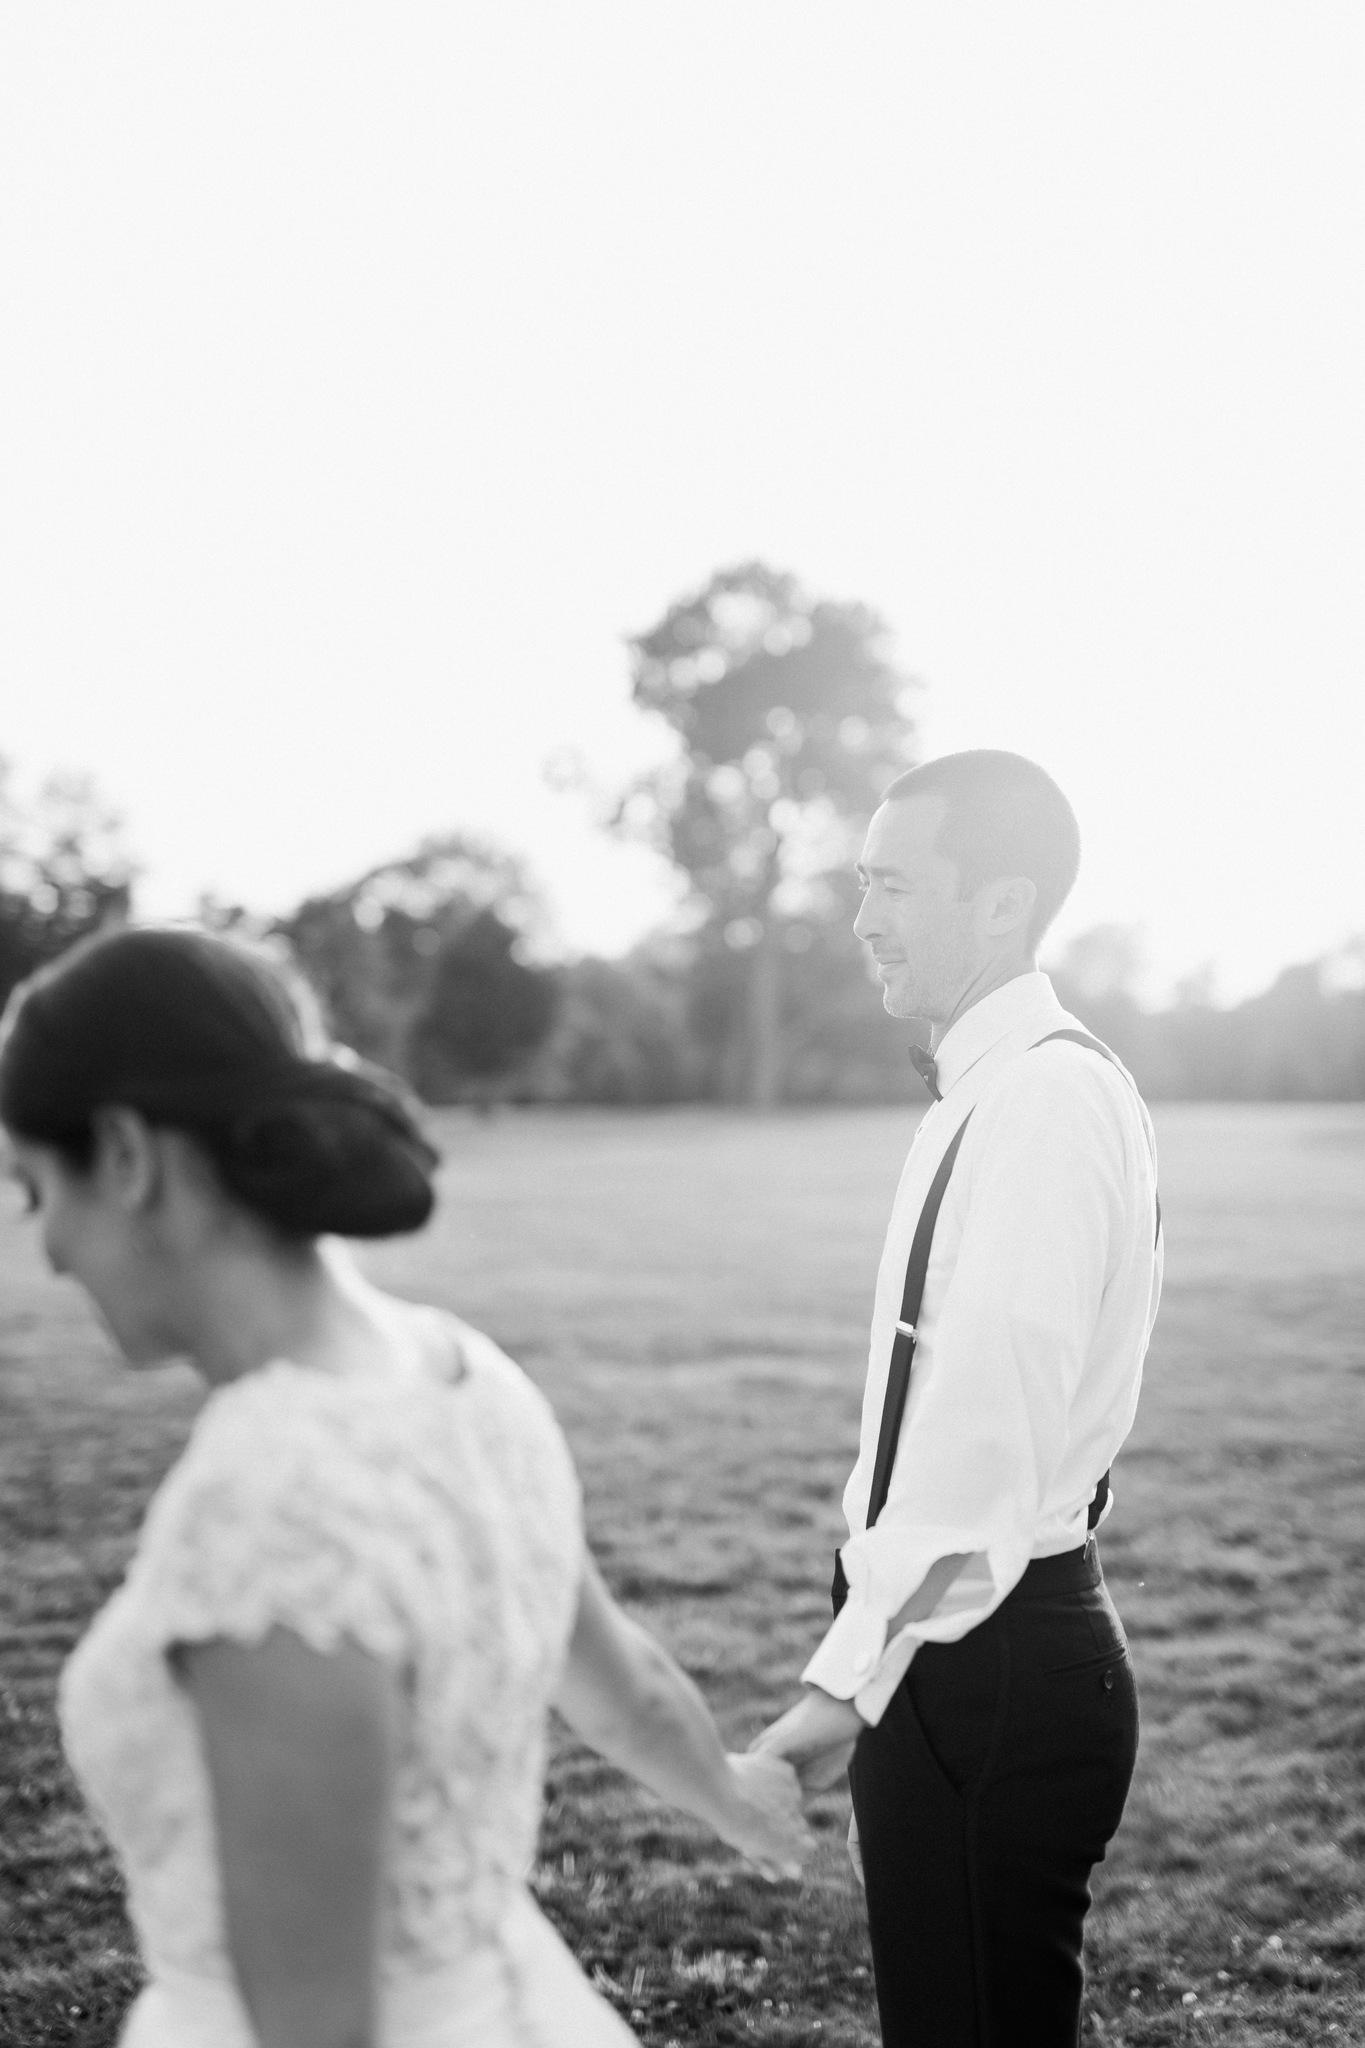 waveny park wedding_iconic wedding photos_CT wedding_gallaher mansion wedding_CT wedding photographer-3.jpg